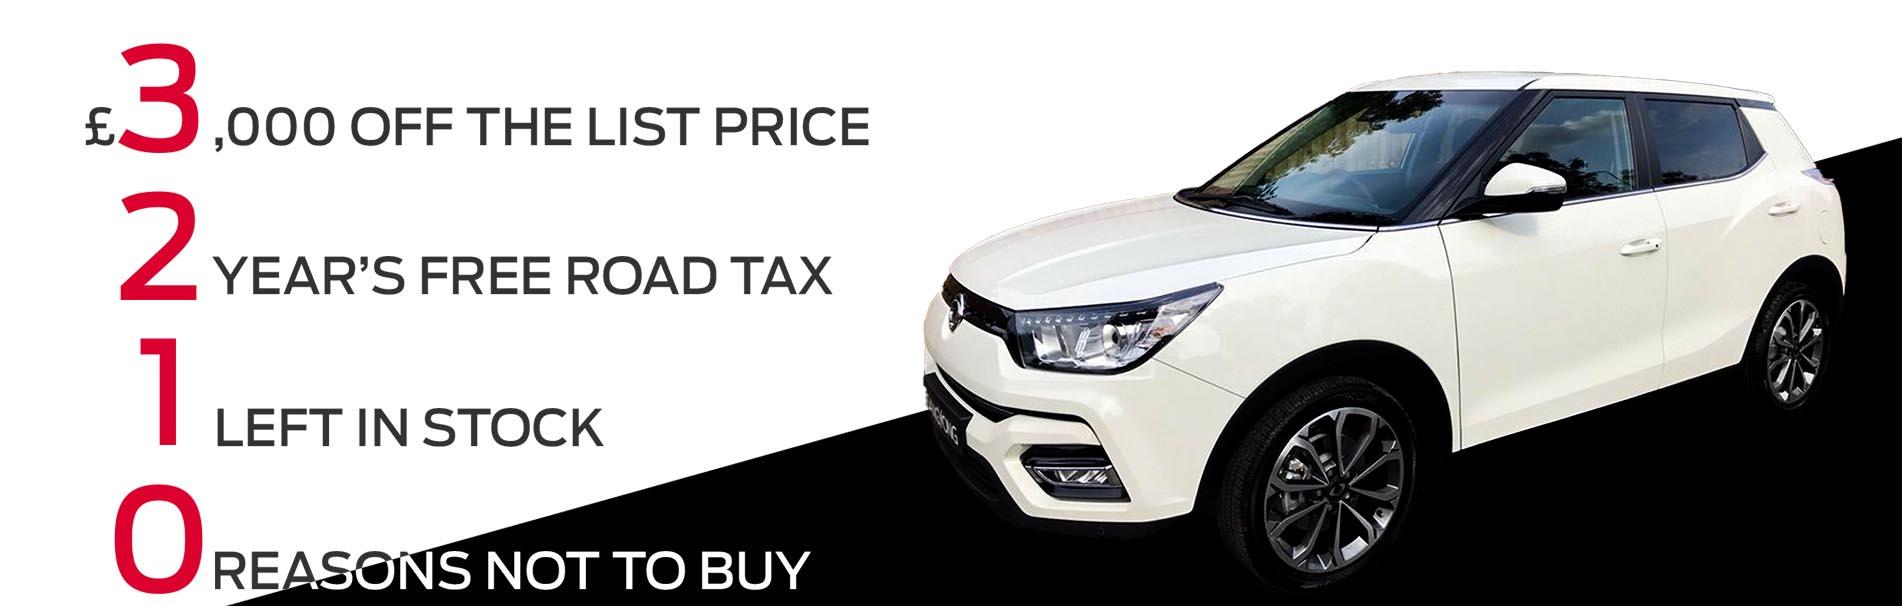 tivoli-ultimate-new-black-friday-car-deals-sli